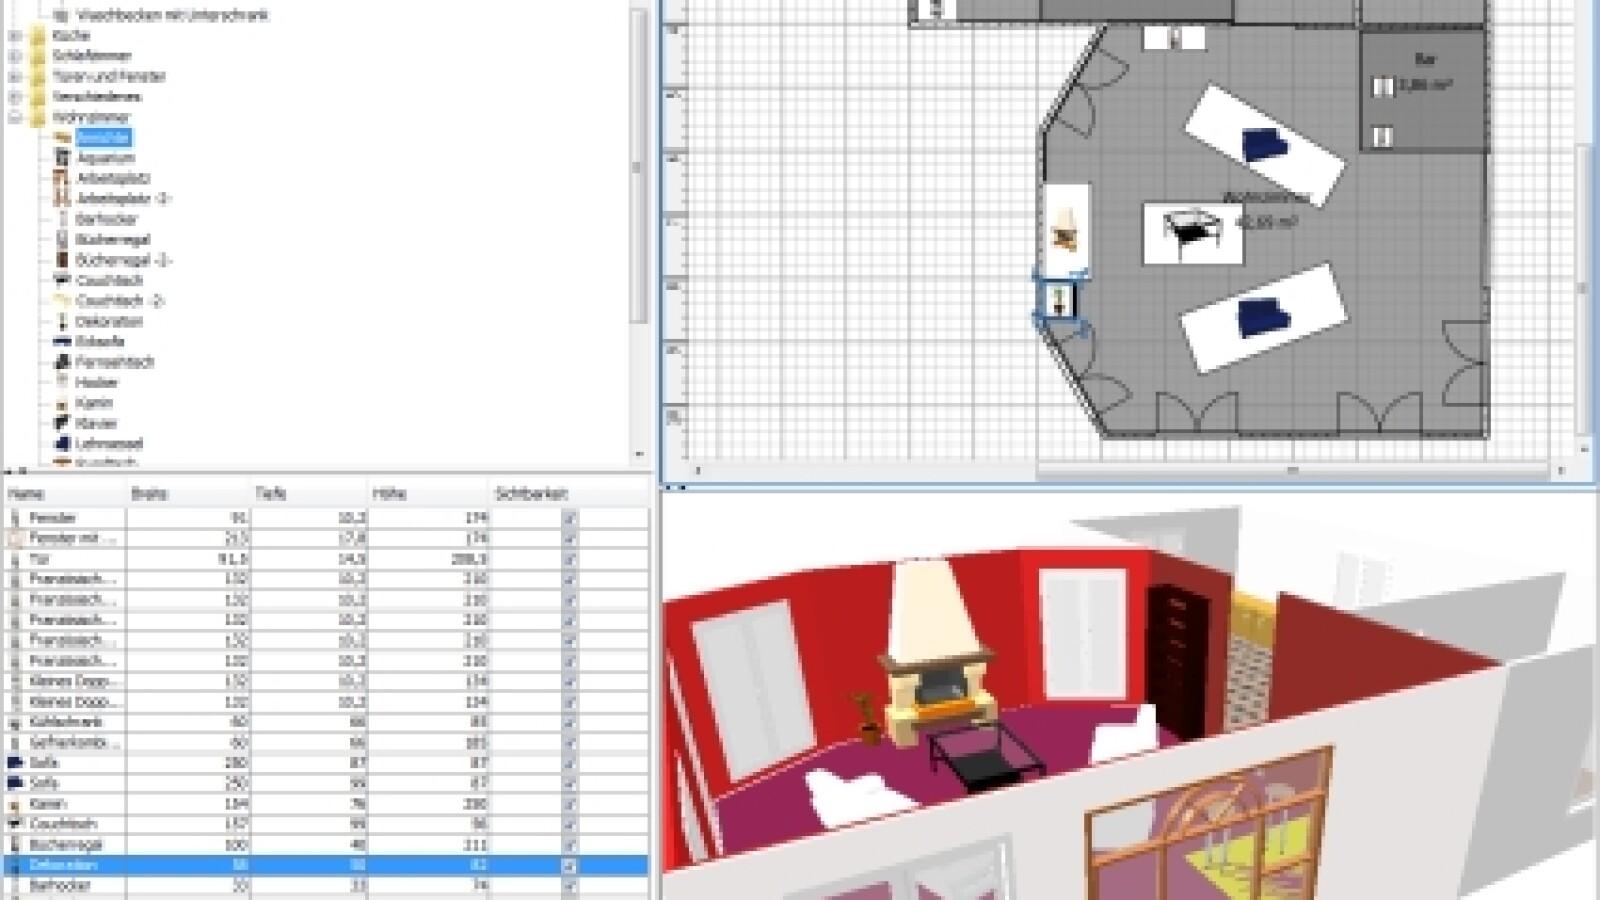 anleitung: wohnungsplaner sweet home 3d - netzwelt